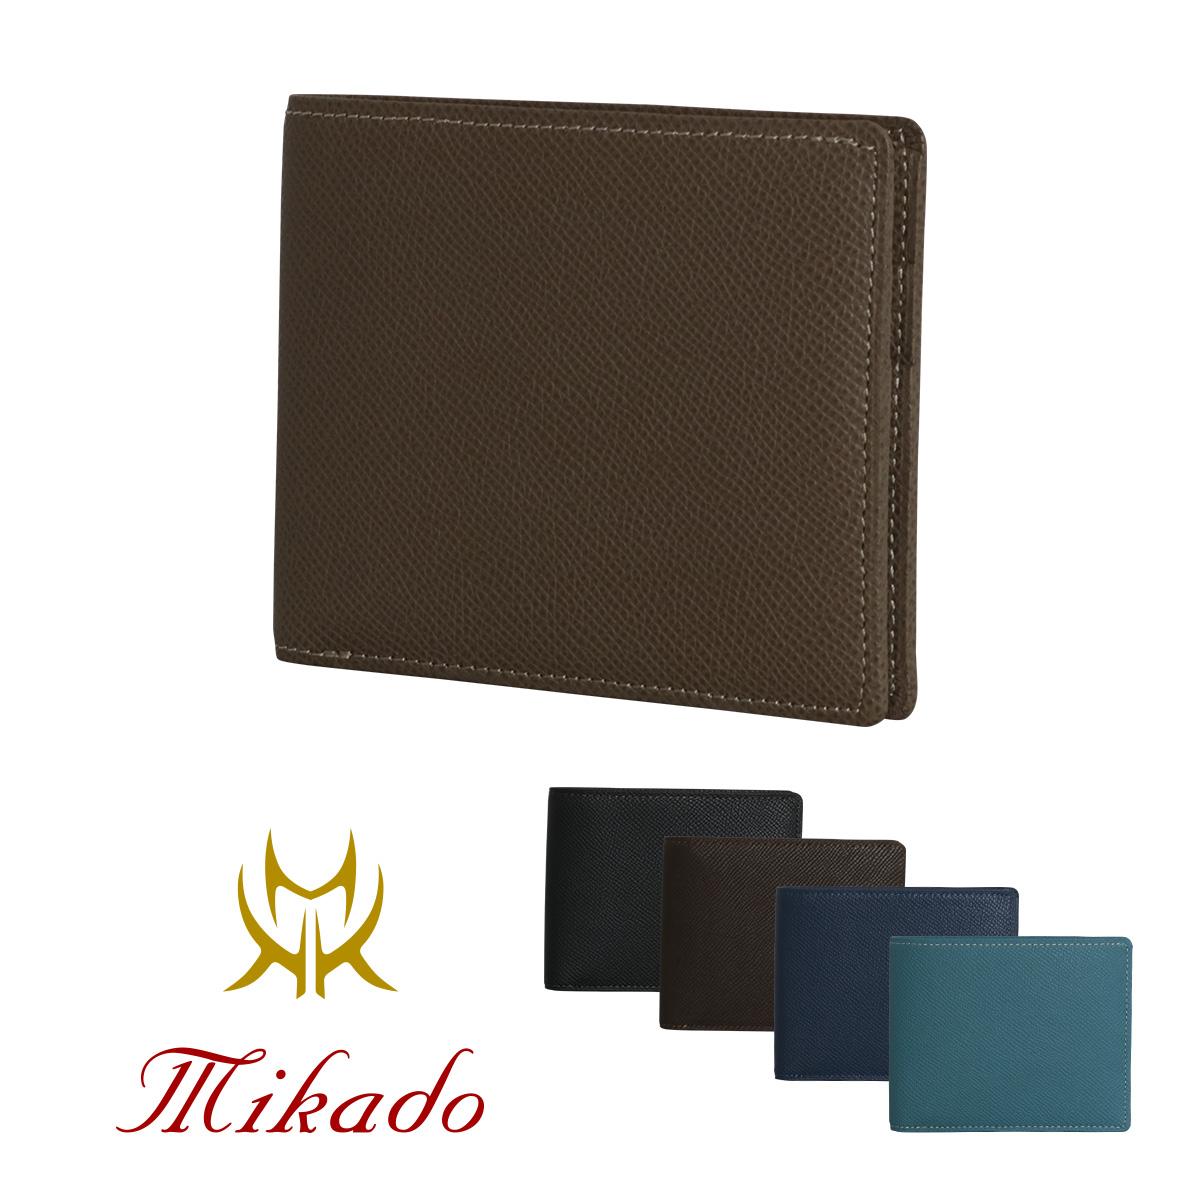 Mikado 二つ折り財布 小銭入れなし メンズ ワープロラックス 日本製 727016 ミカド レザー [PO5][bef][即日発送]